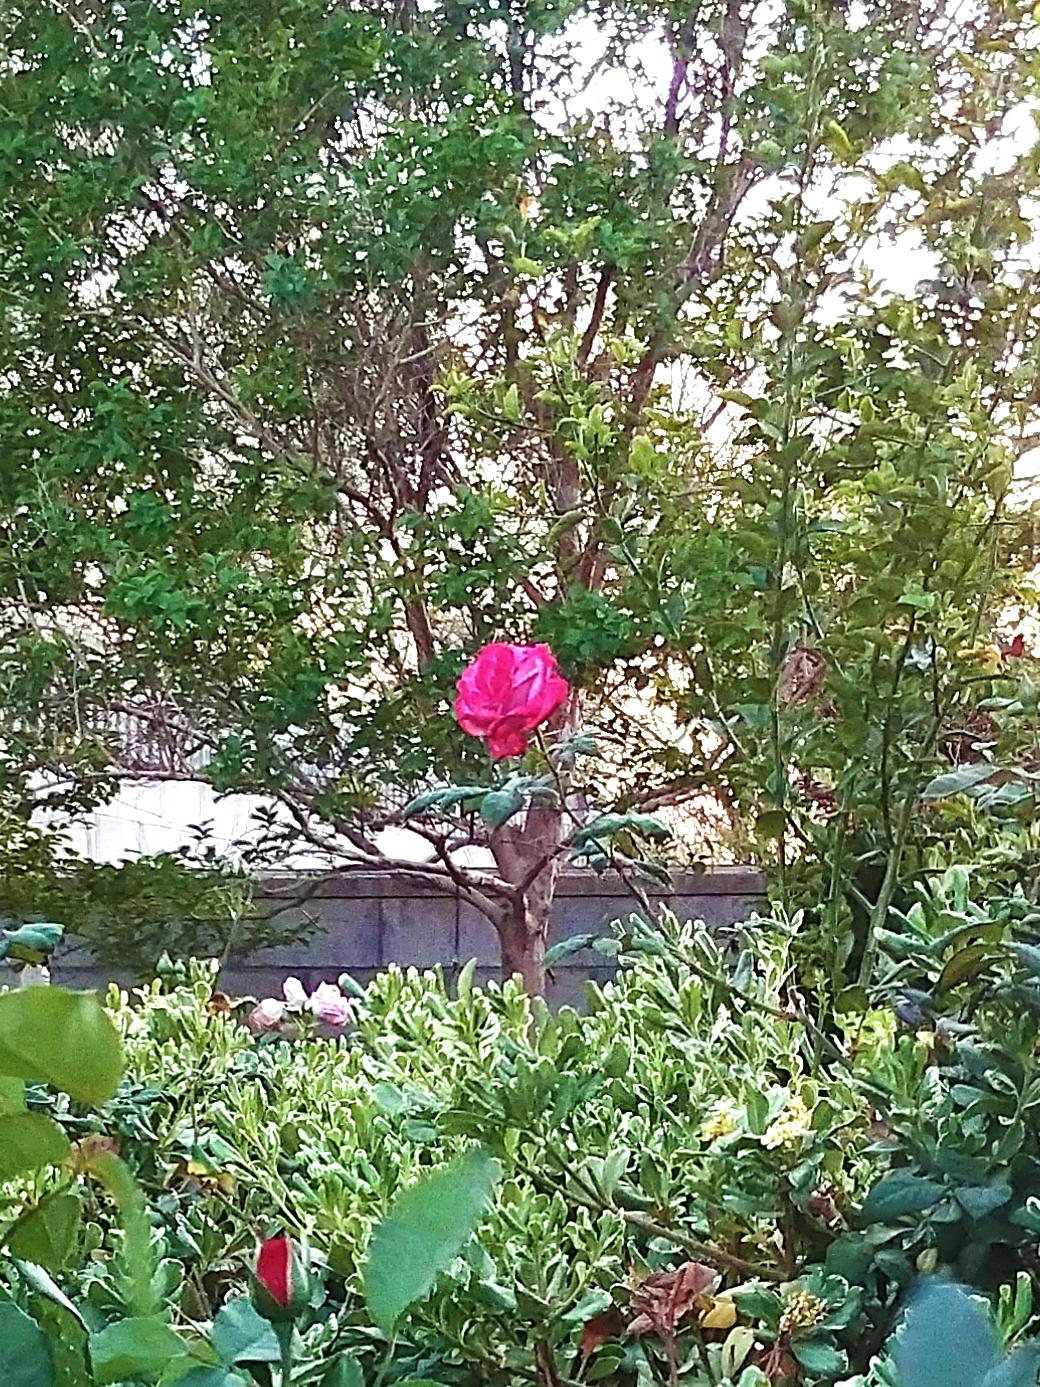 g6 rose colored.jpg